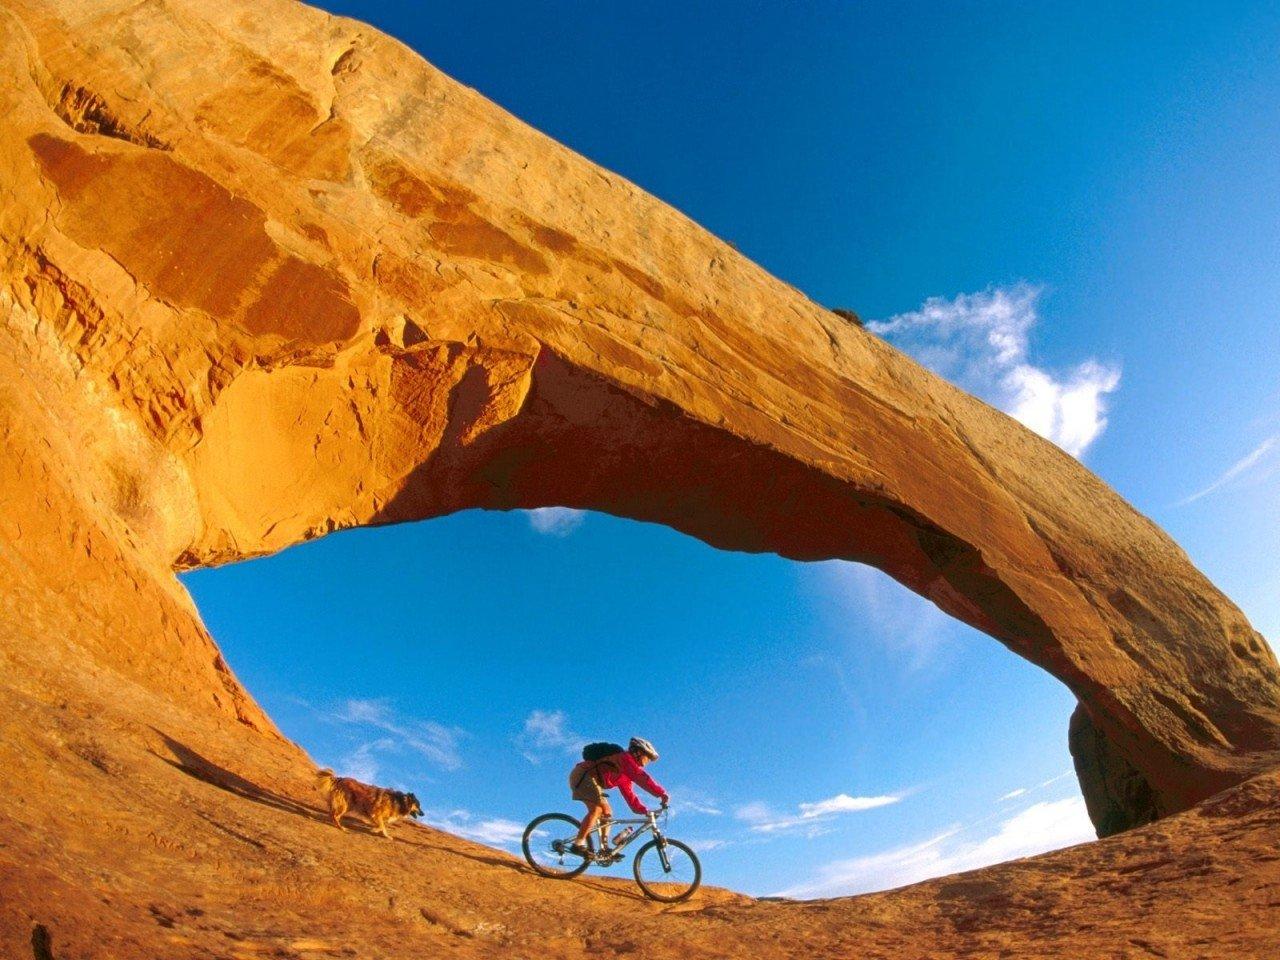 http://4.bp.blogspot.com/-R2iyOAjDslU/T6vzSkHq1ZI/AAAAAAAAAMY/QxY0ikAlDRo/s1600/Cycling-Mountain-Bike-002.jpg